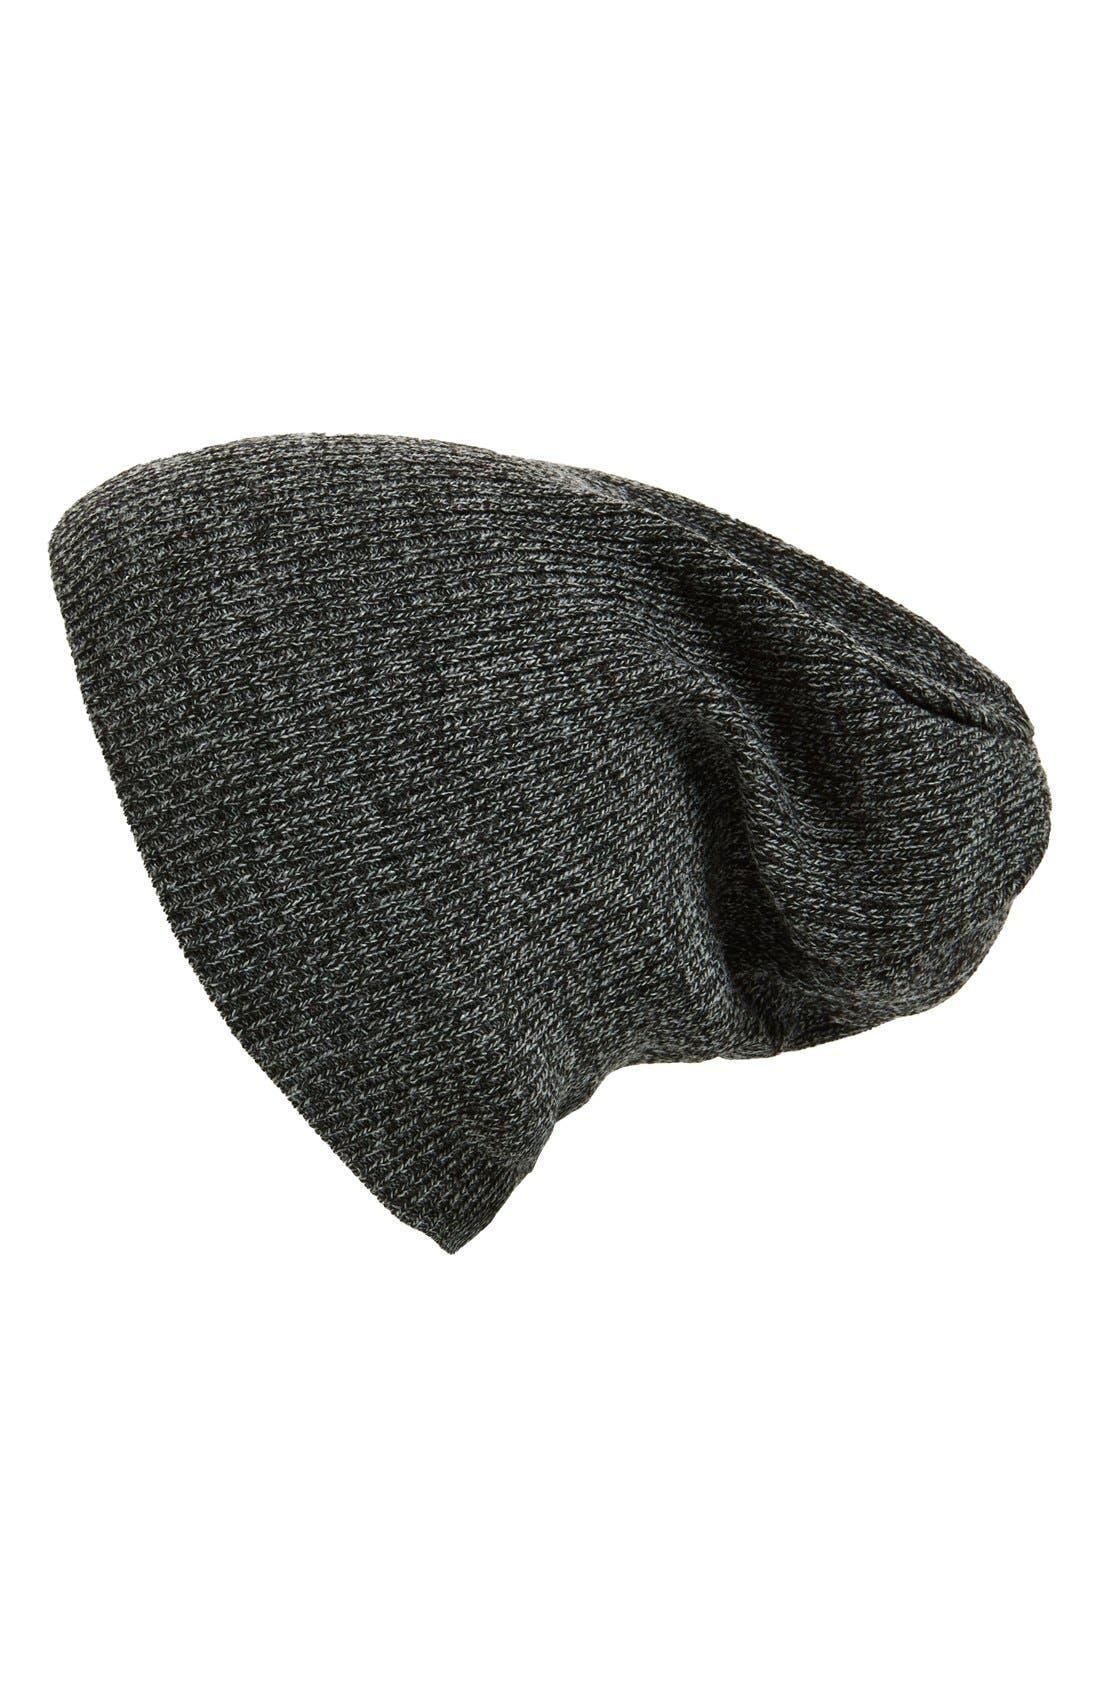 Main Image - Topman Slouchy Knit Cap